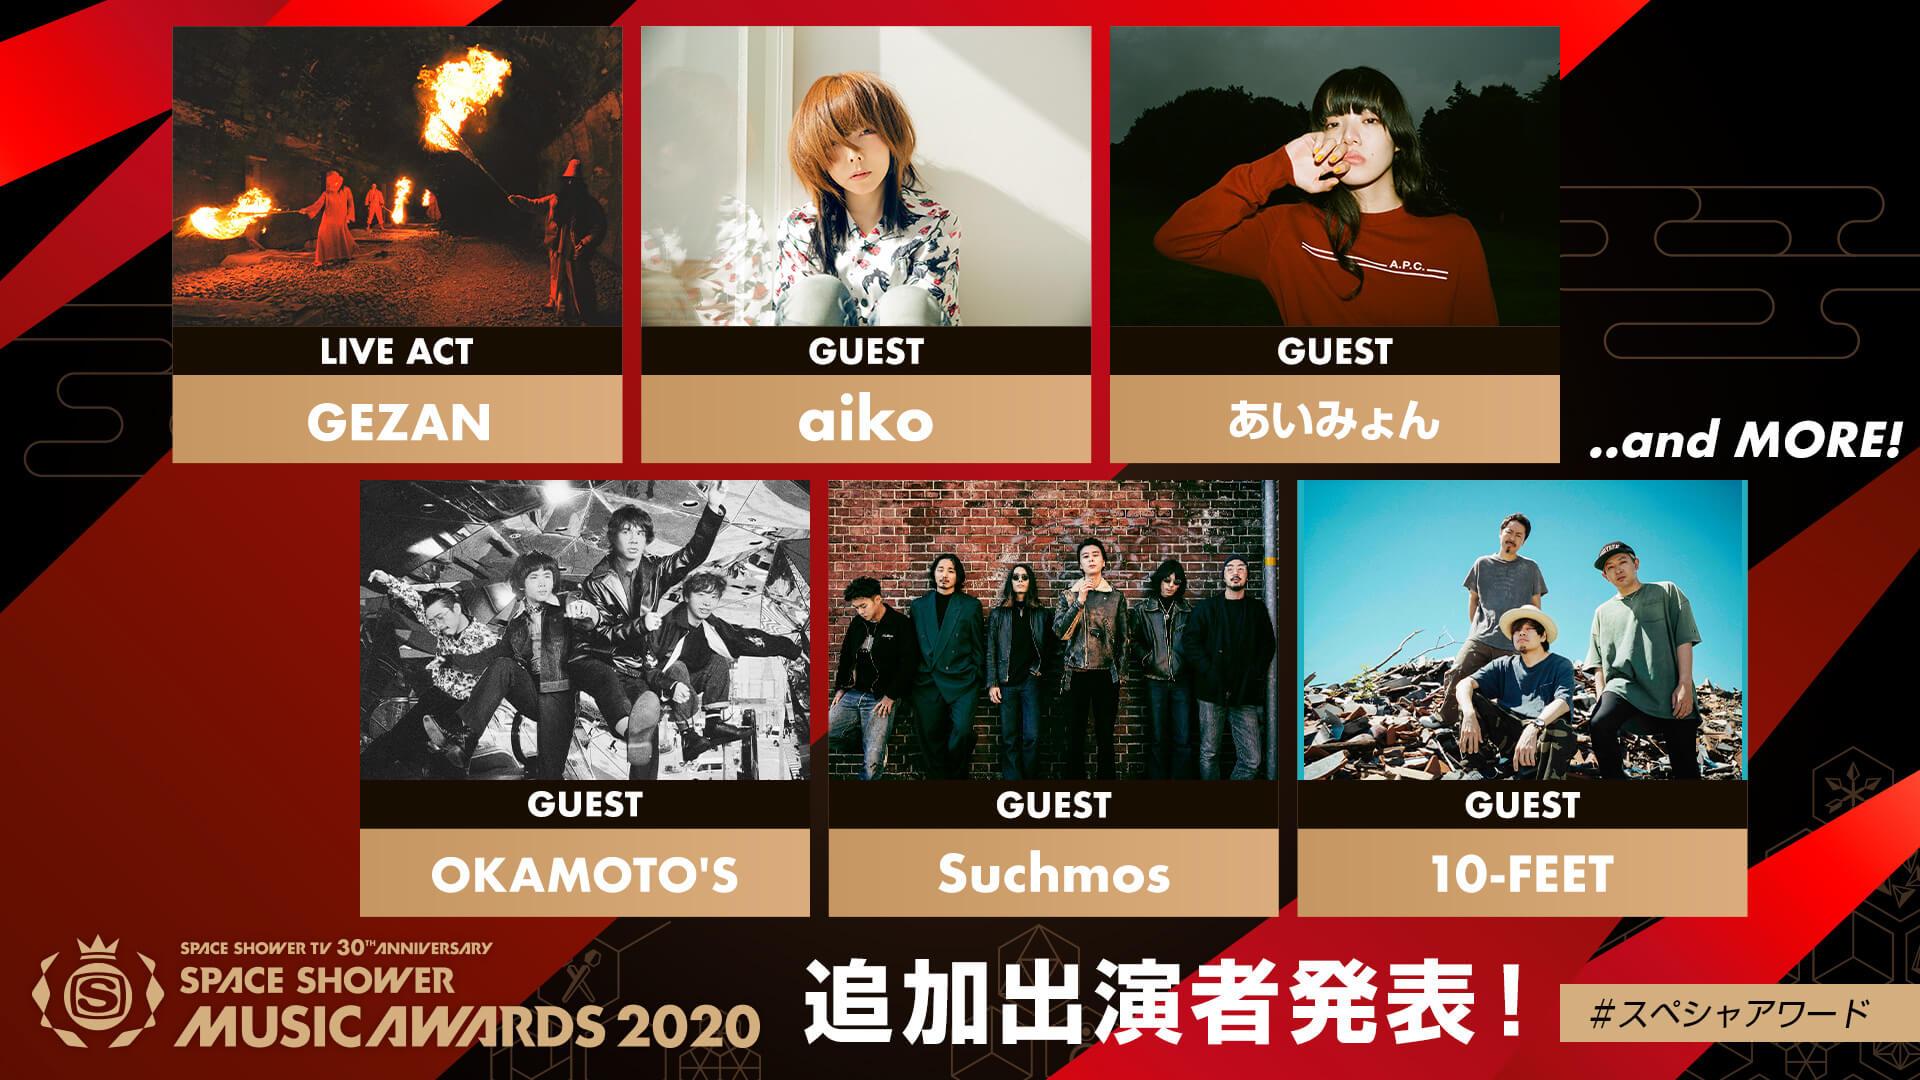 <SPACE SHOWER MUSIC AWARDS 2020>追加ライブアクトにGEZAN|ゲストとしてaiko、あいみょん、Suchmosらも music200206_spacemusicawards_1